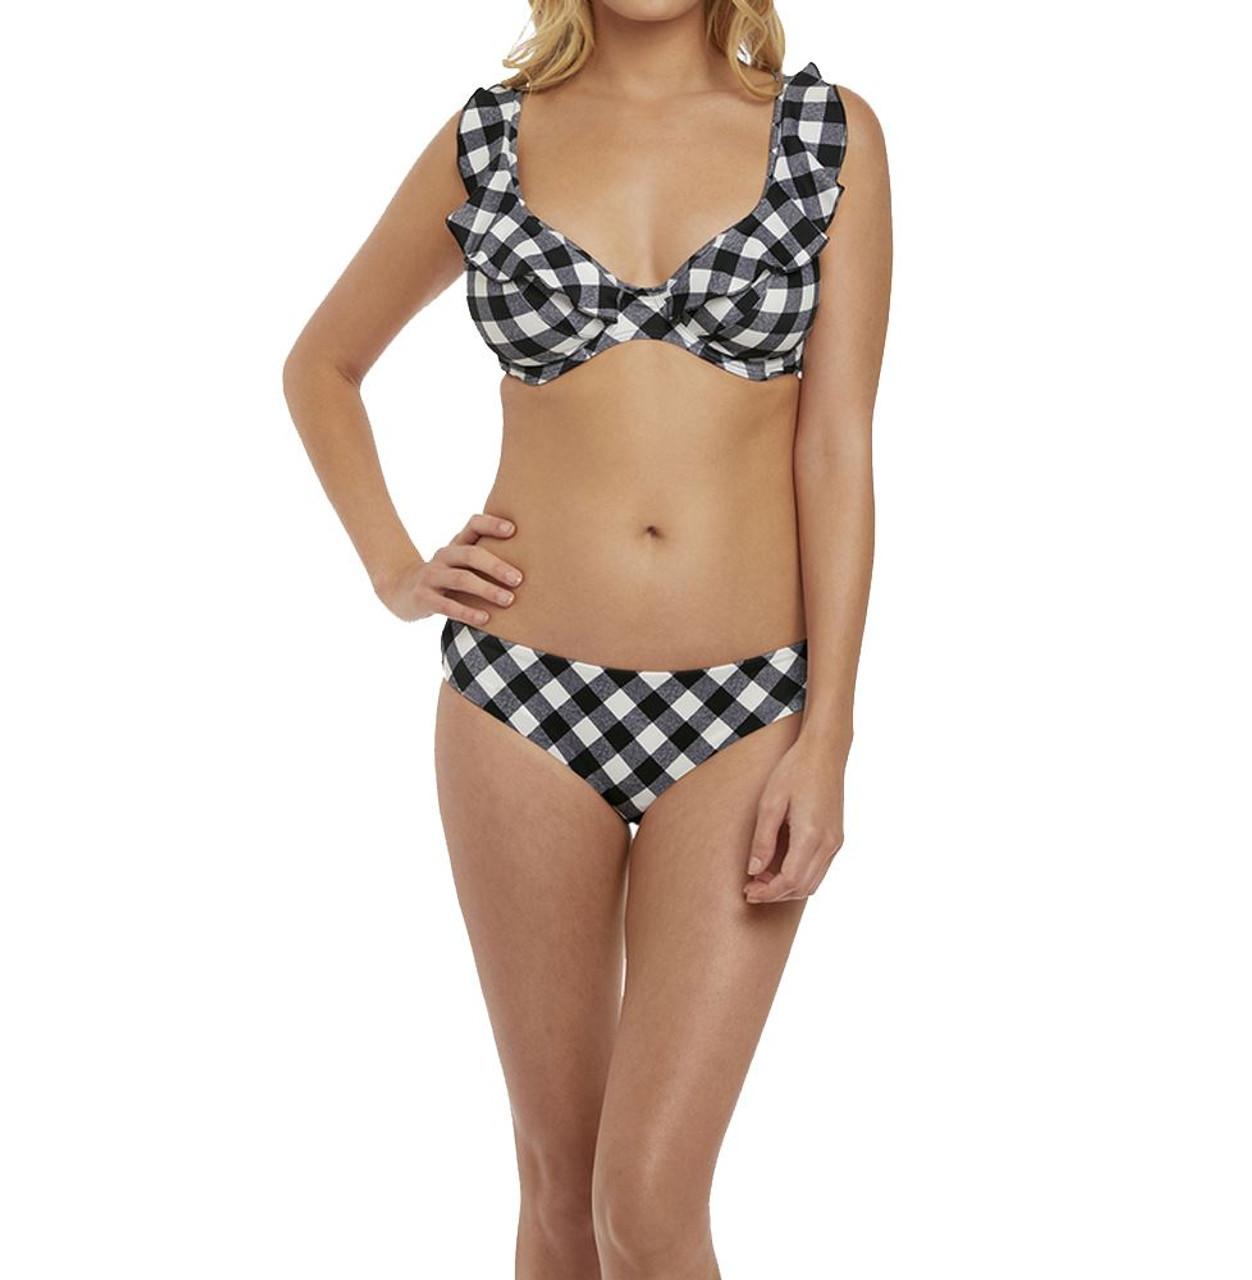 Freya Totally Check AS2924 W Underwired Halter Bikini Top Monochrome 34 H CS